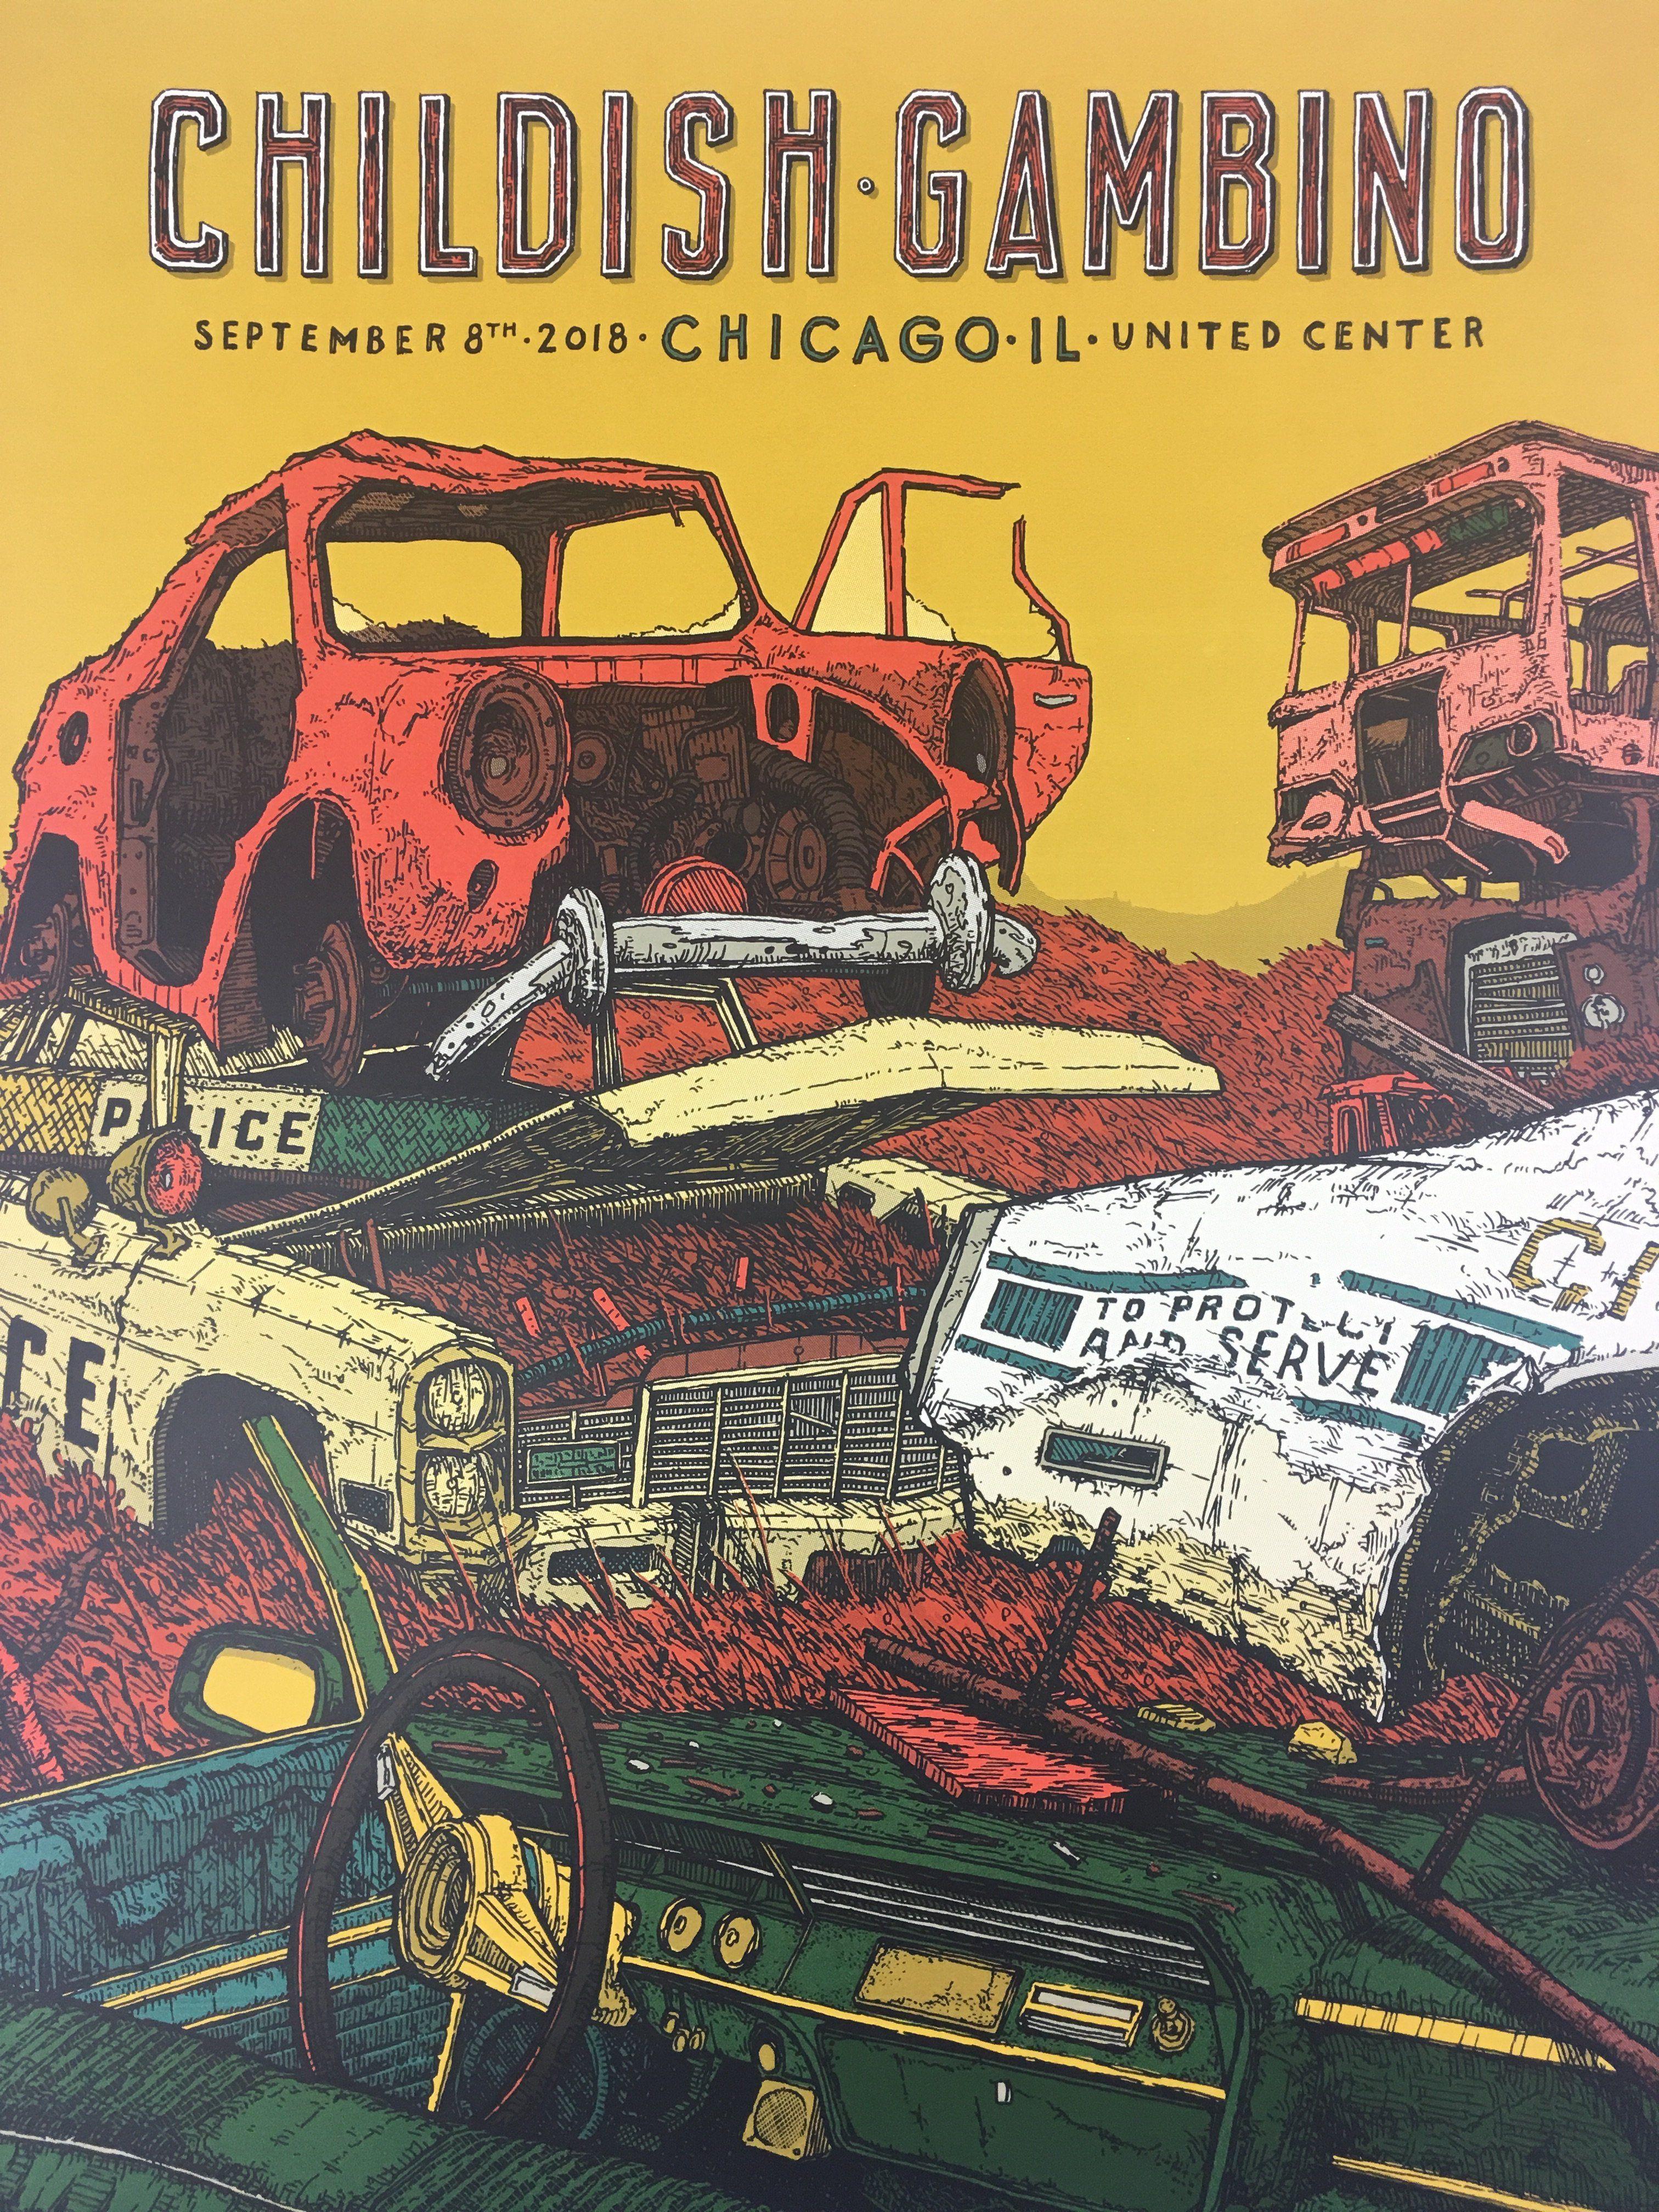 Childish Gambino - 2018 Landland Poster Chicago, IL United Center